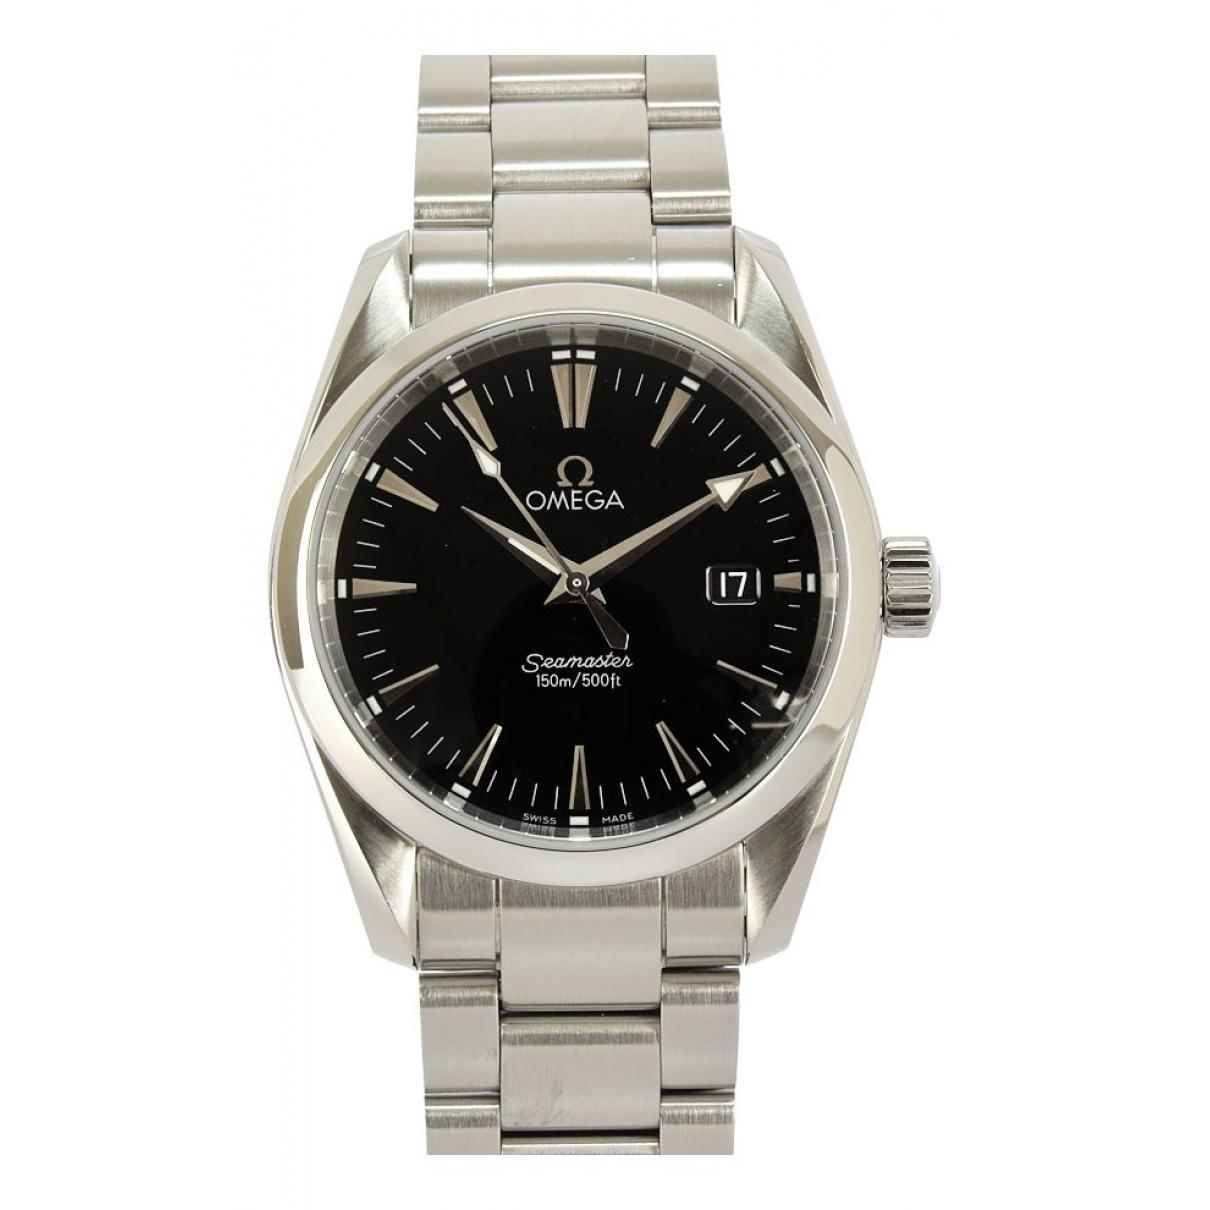 Omega Seamaster Aquaterra Uhr in  Schwarz Stahl